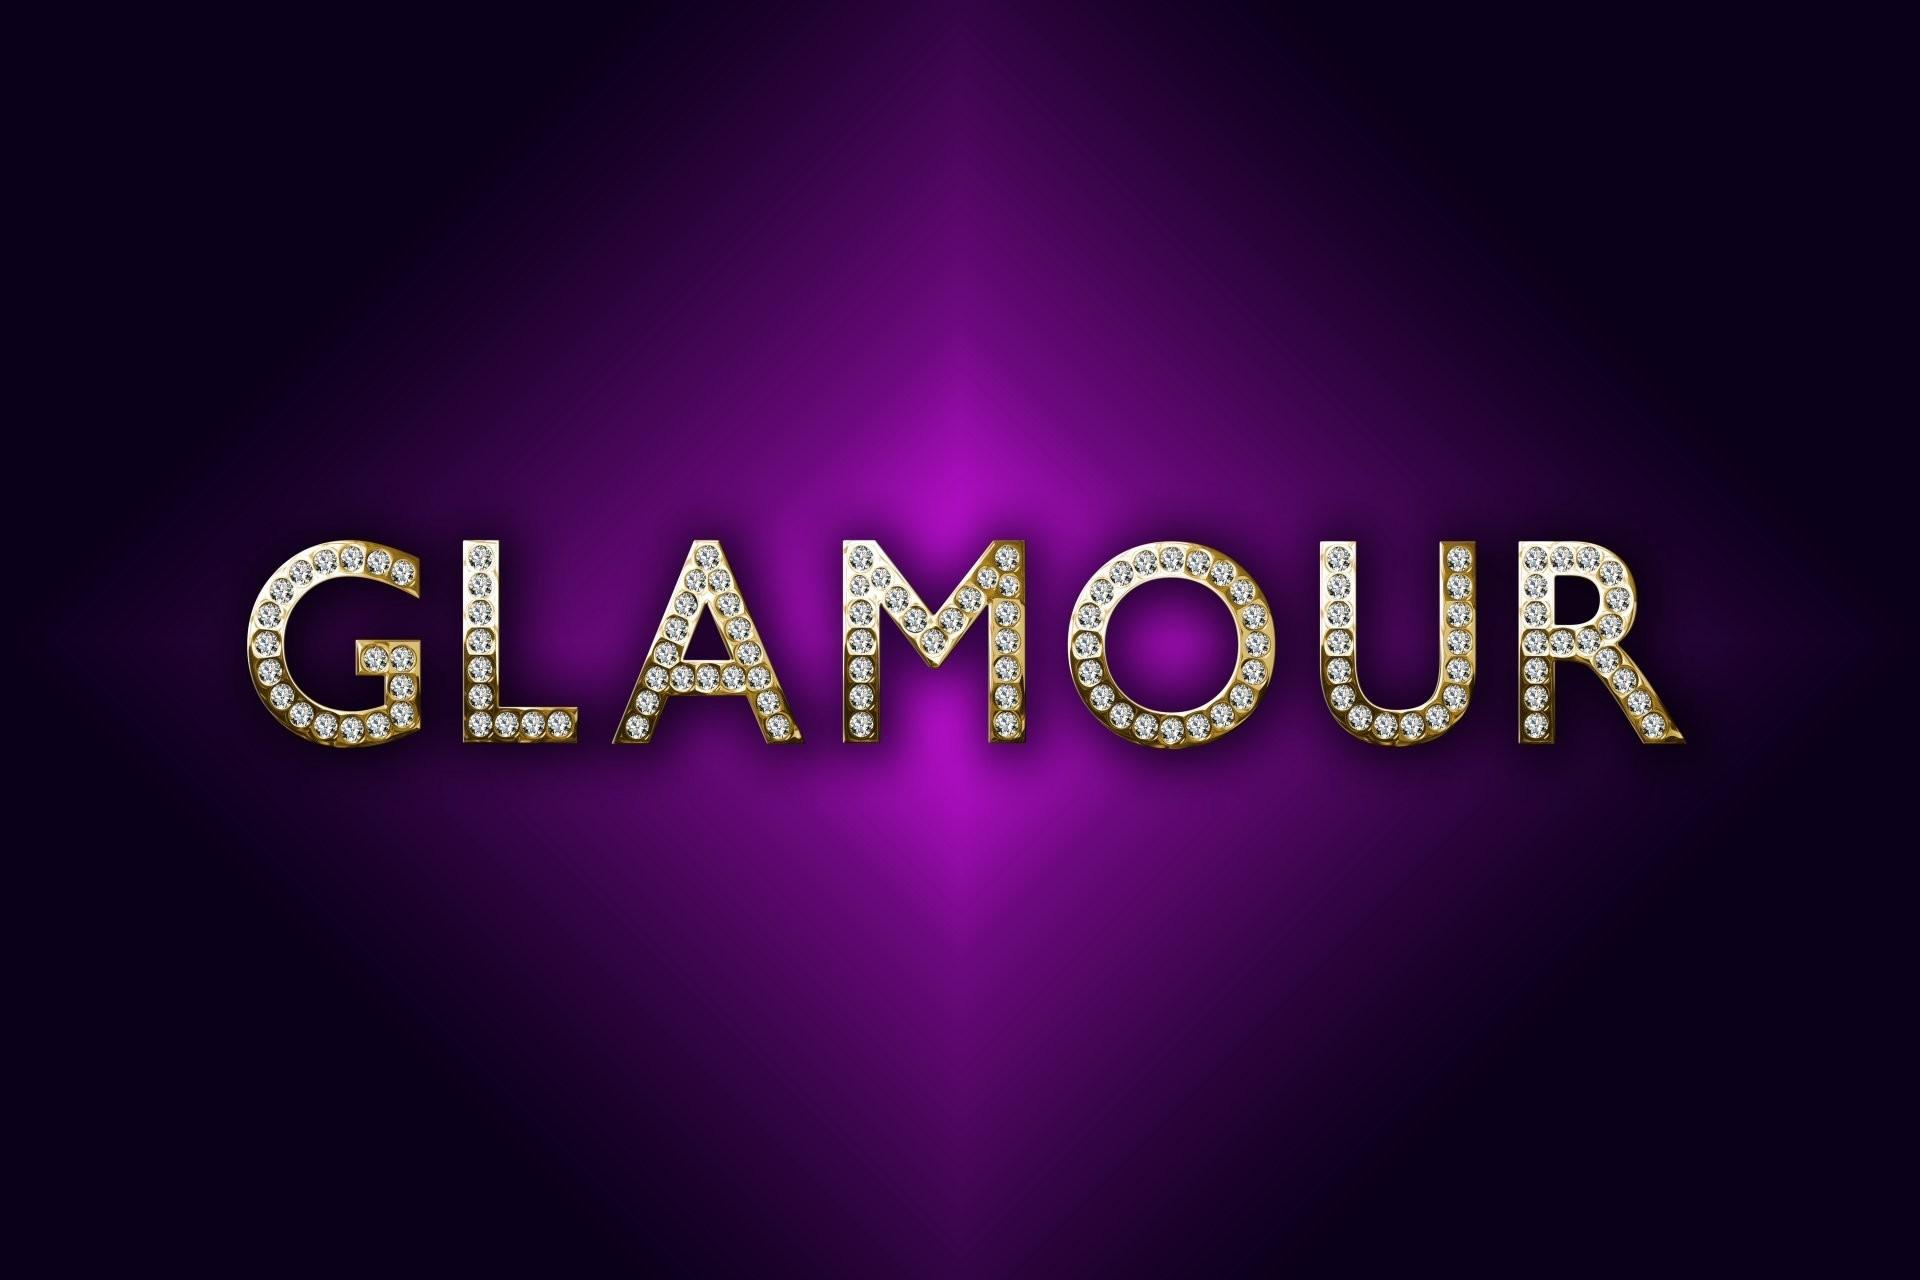 glamour luxury gold diamonds letters purple background design by marika